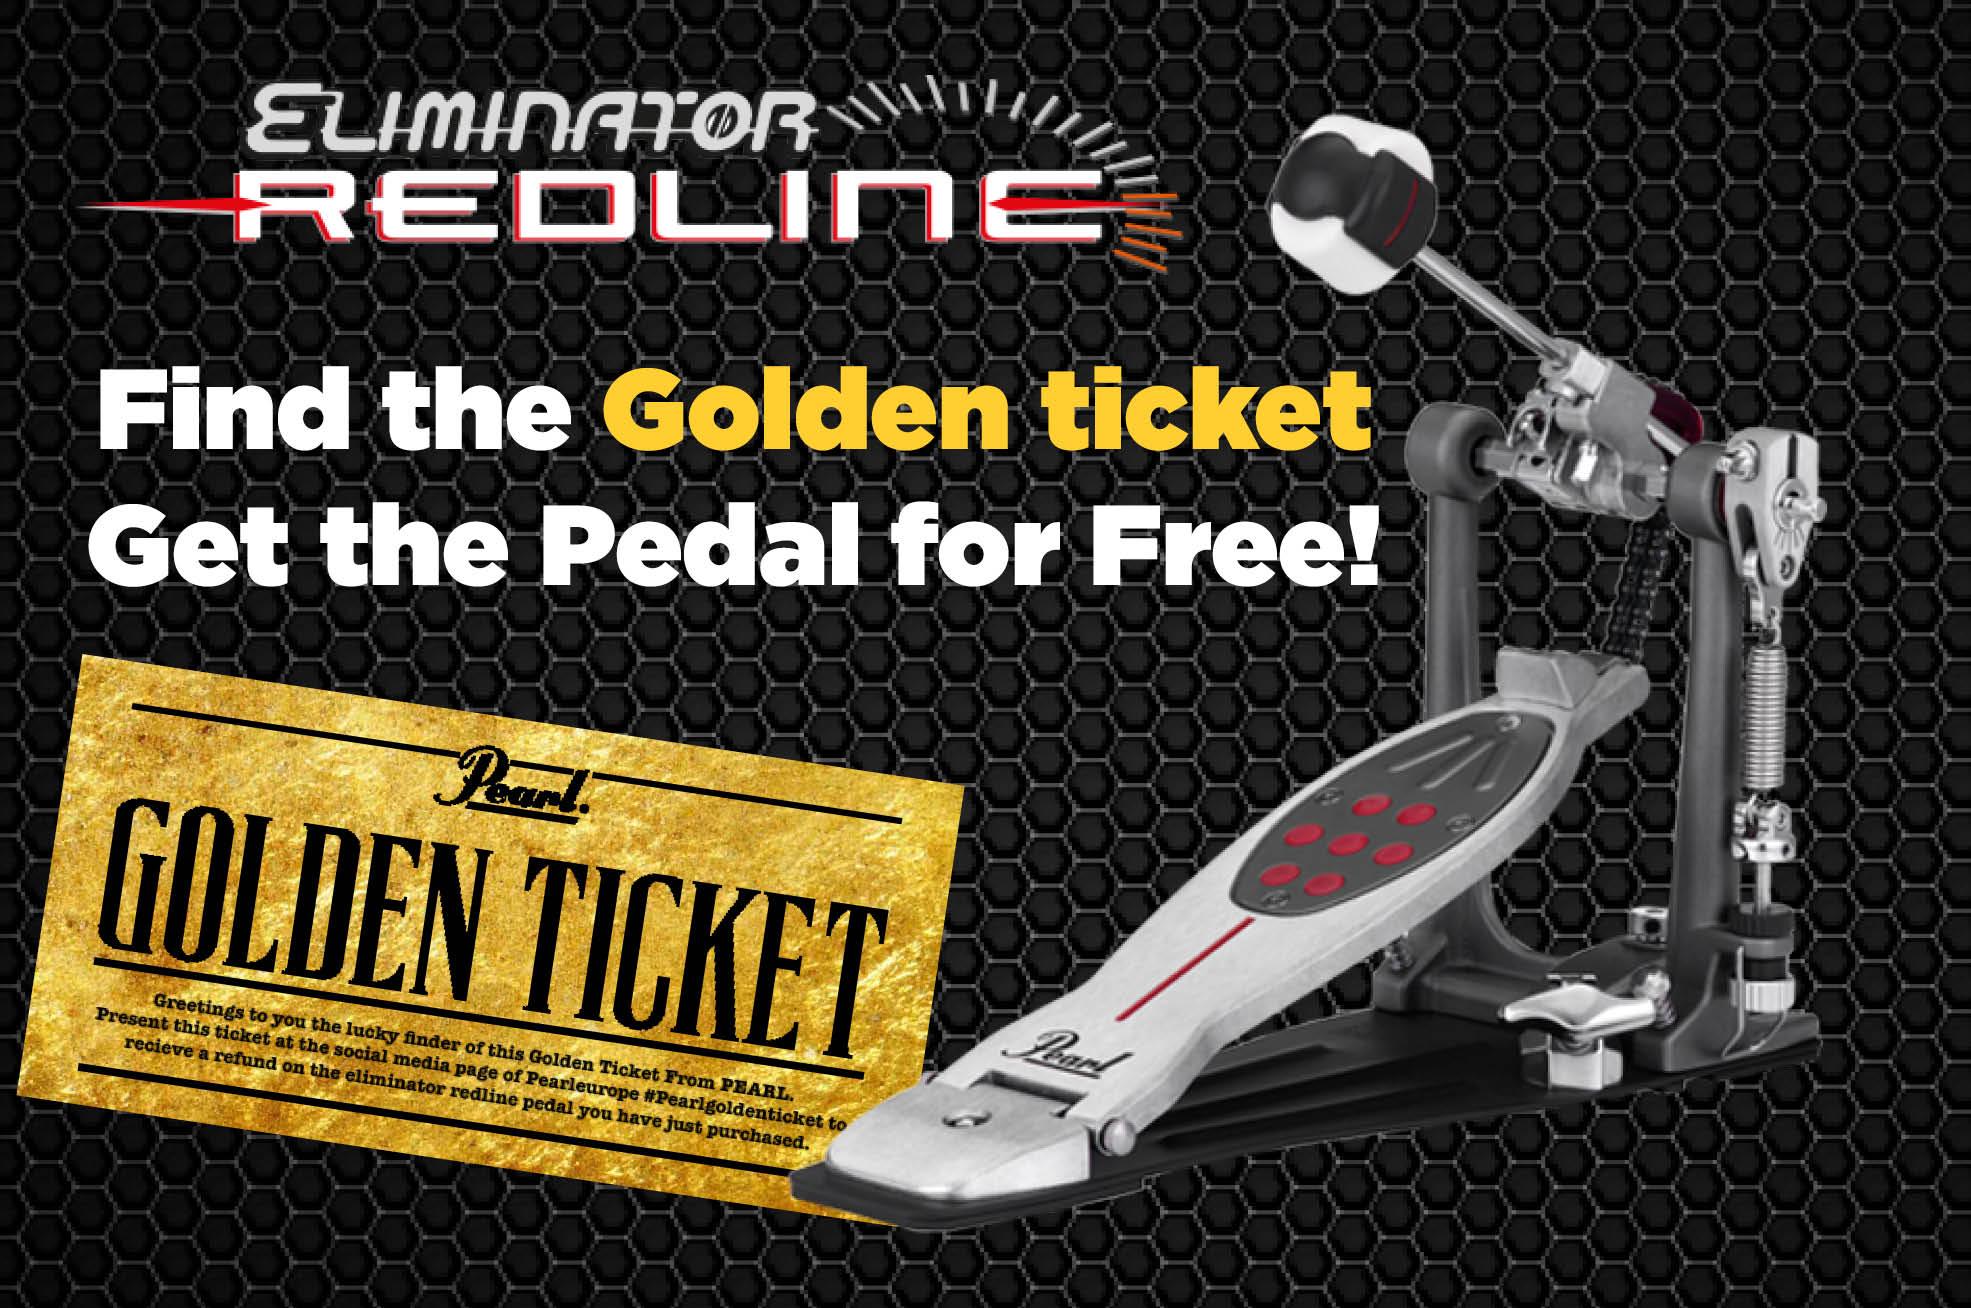 Pearl Eliminator Golden Ticket